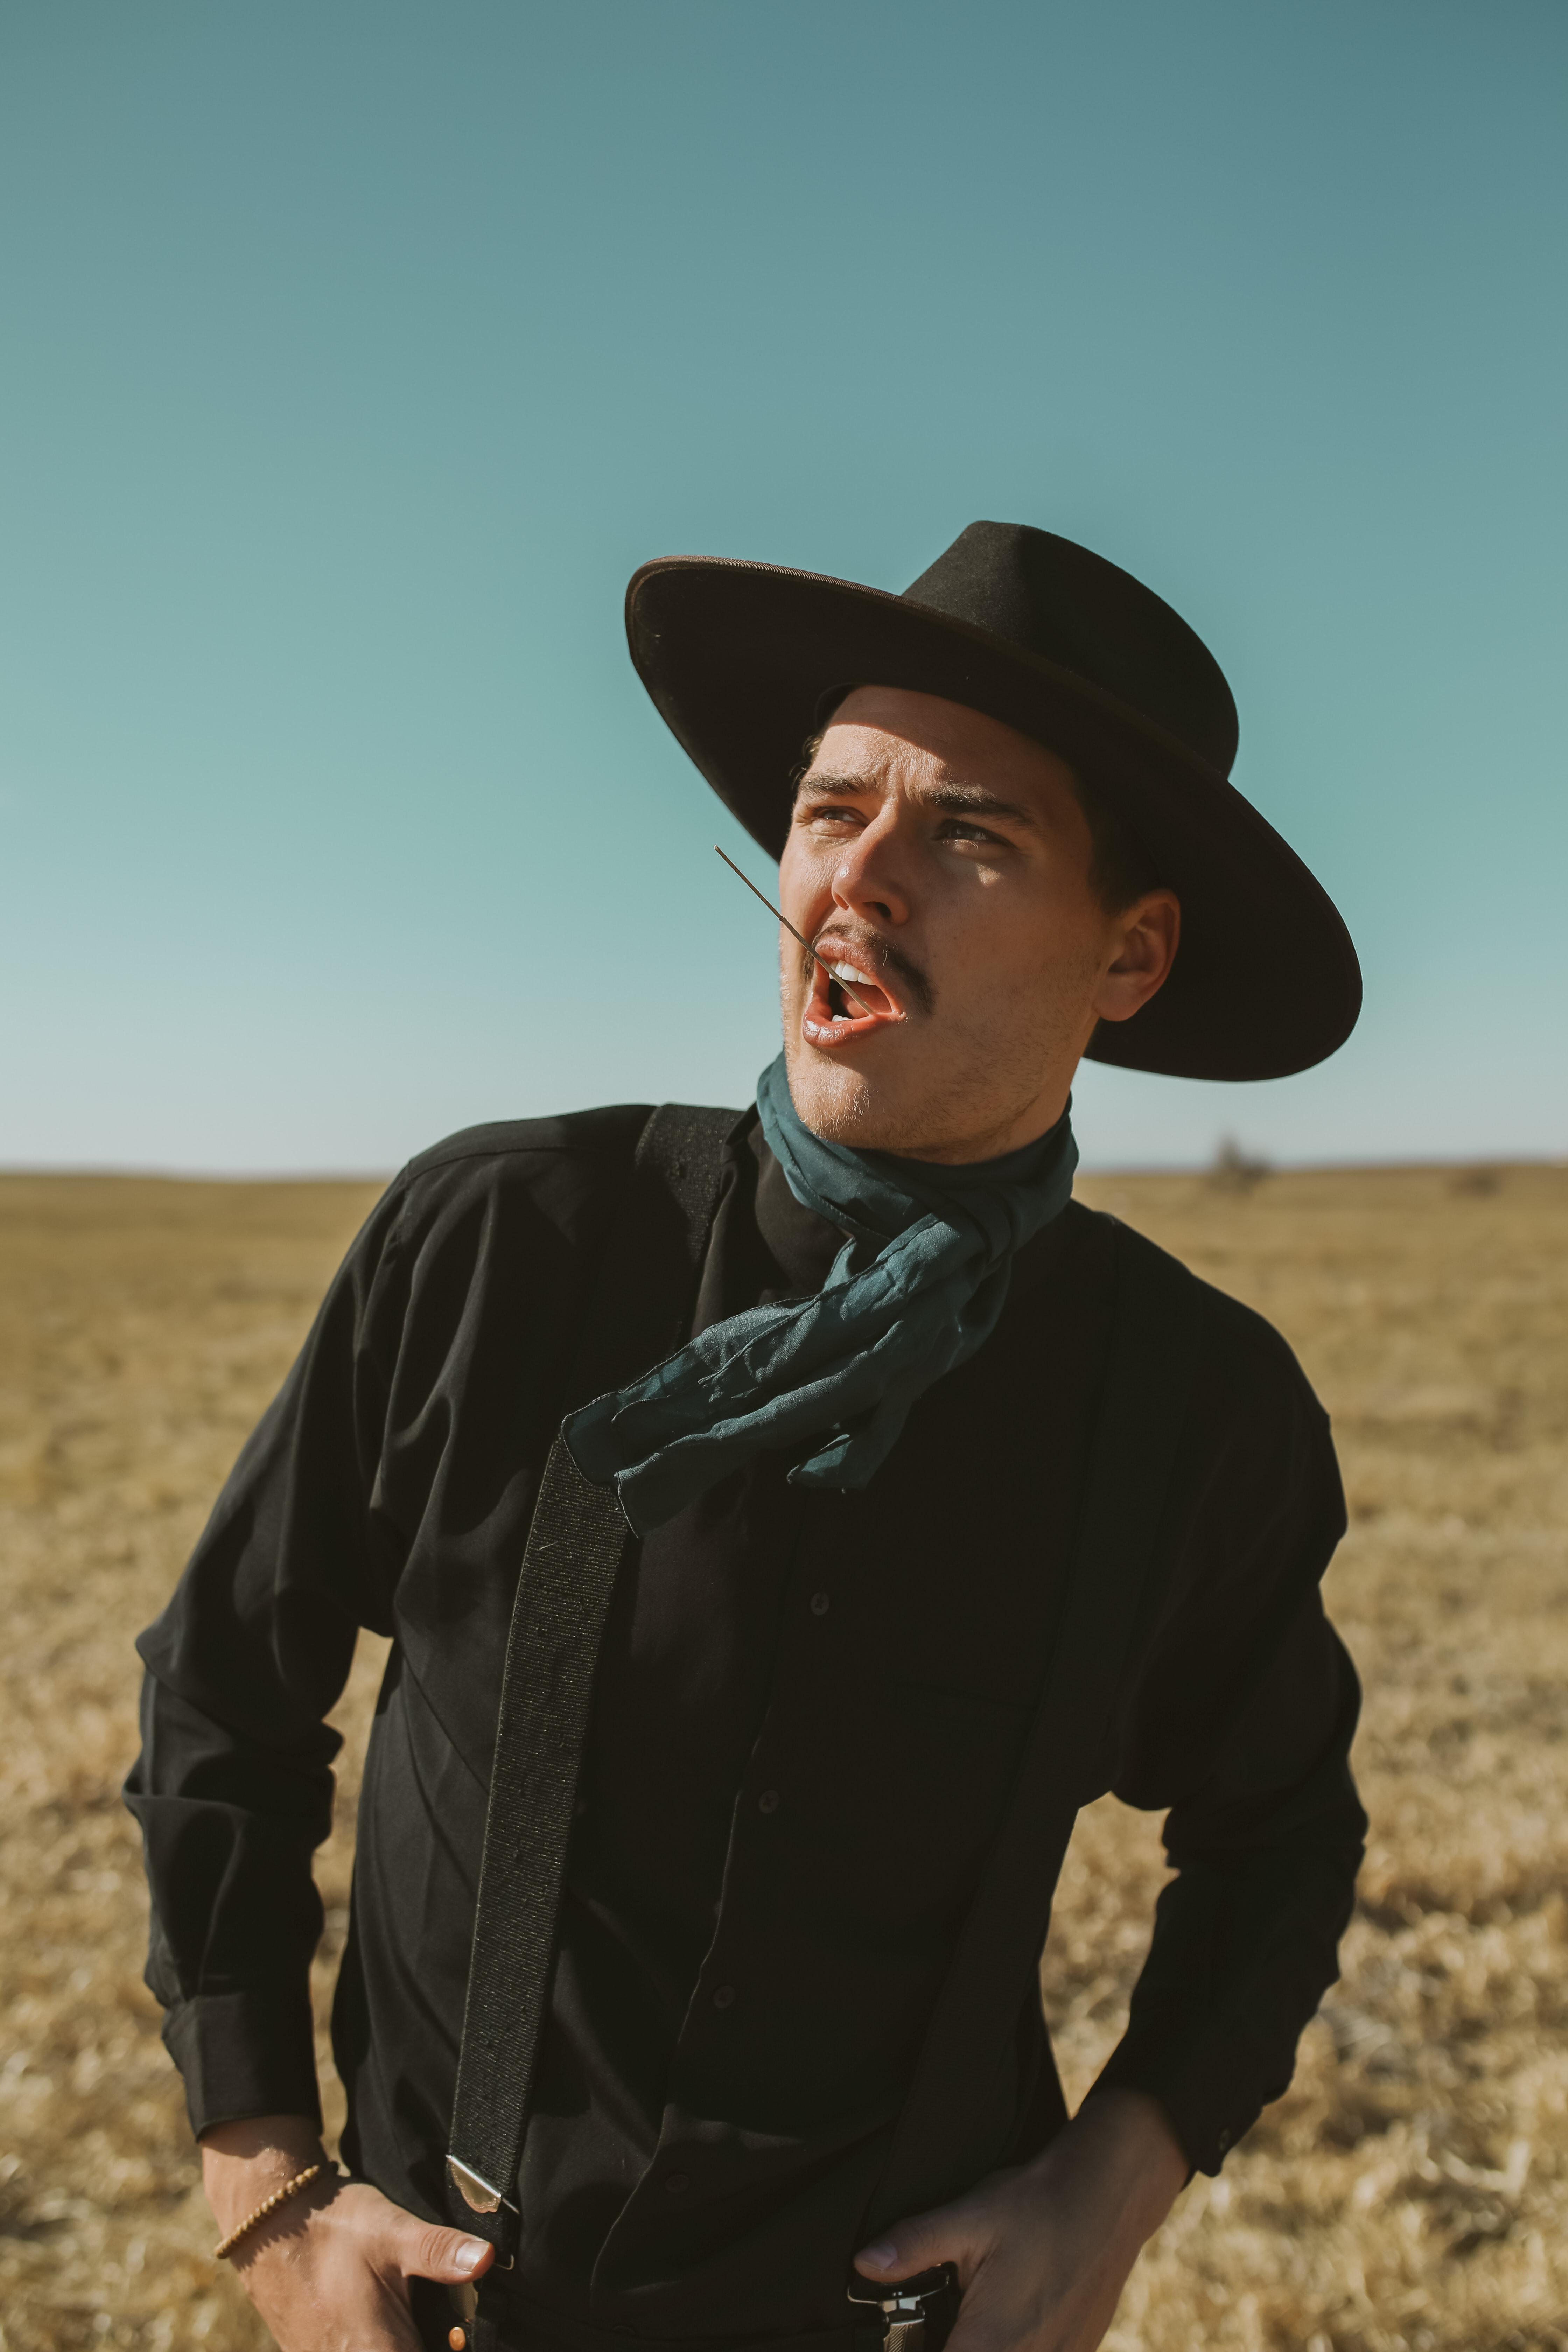 Cowboy Builder